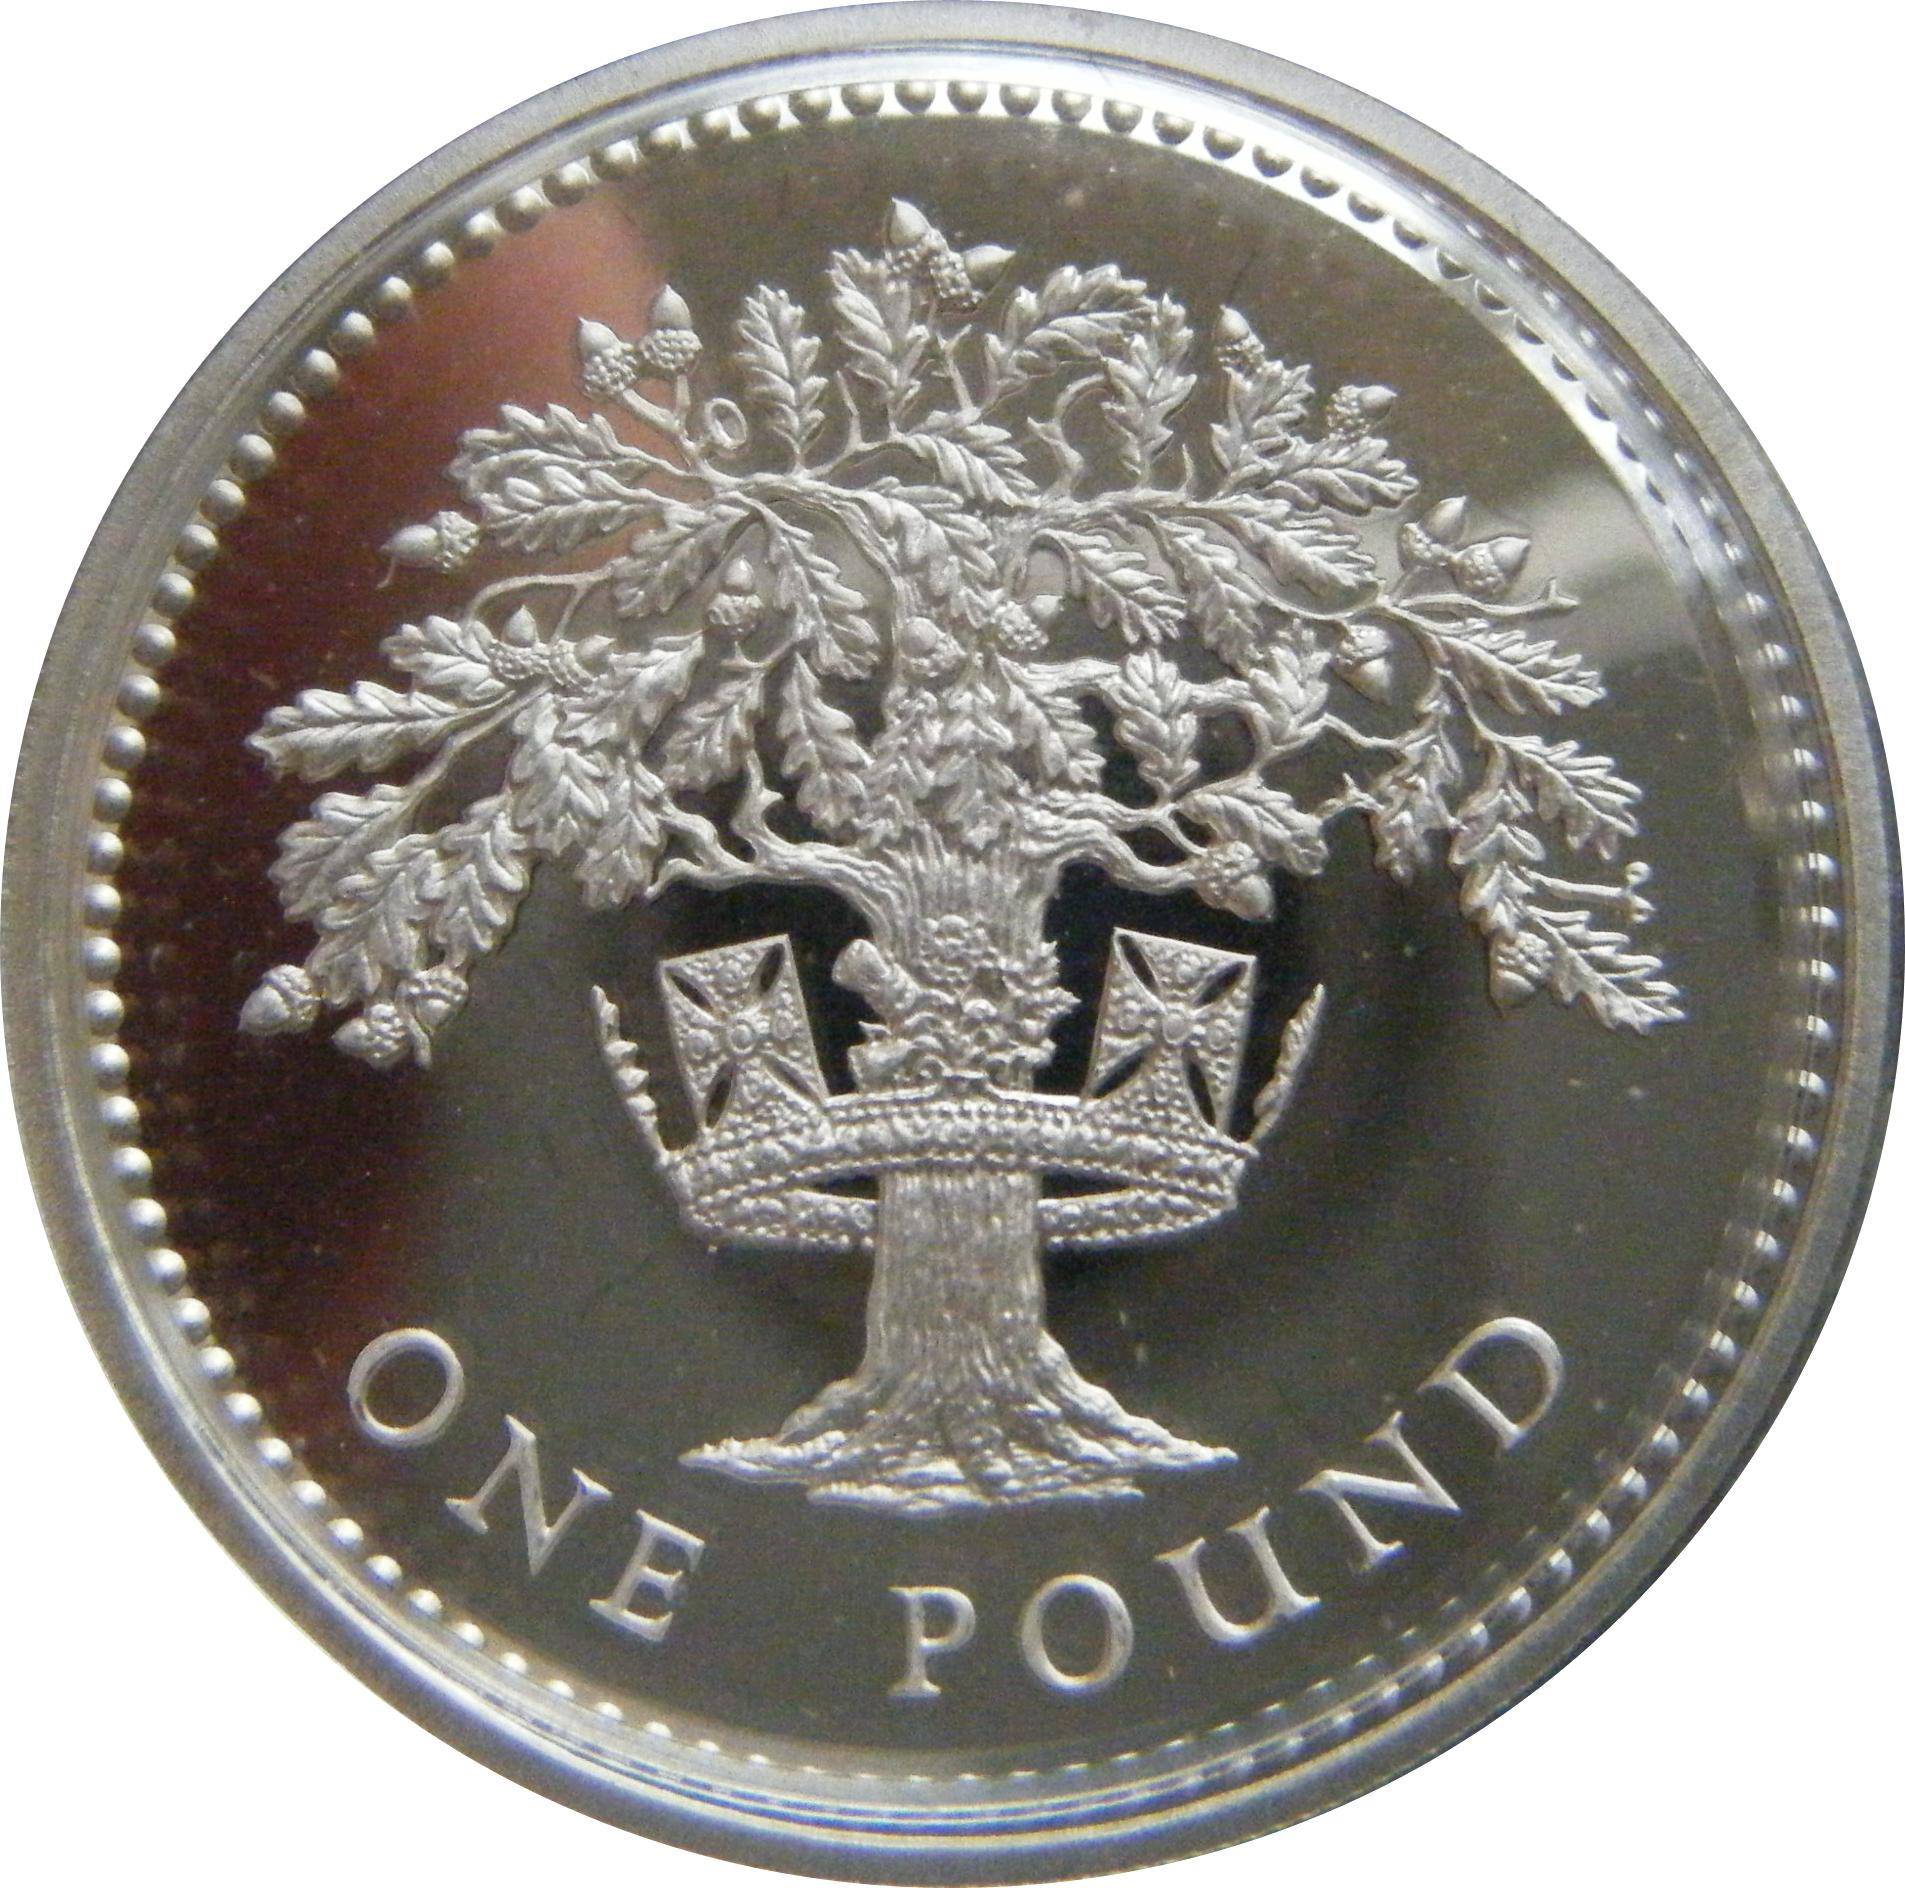 1 Pound Elizabeth Ii English Oak Silver Proof